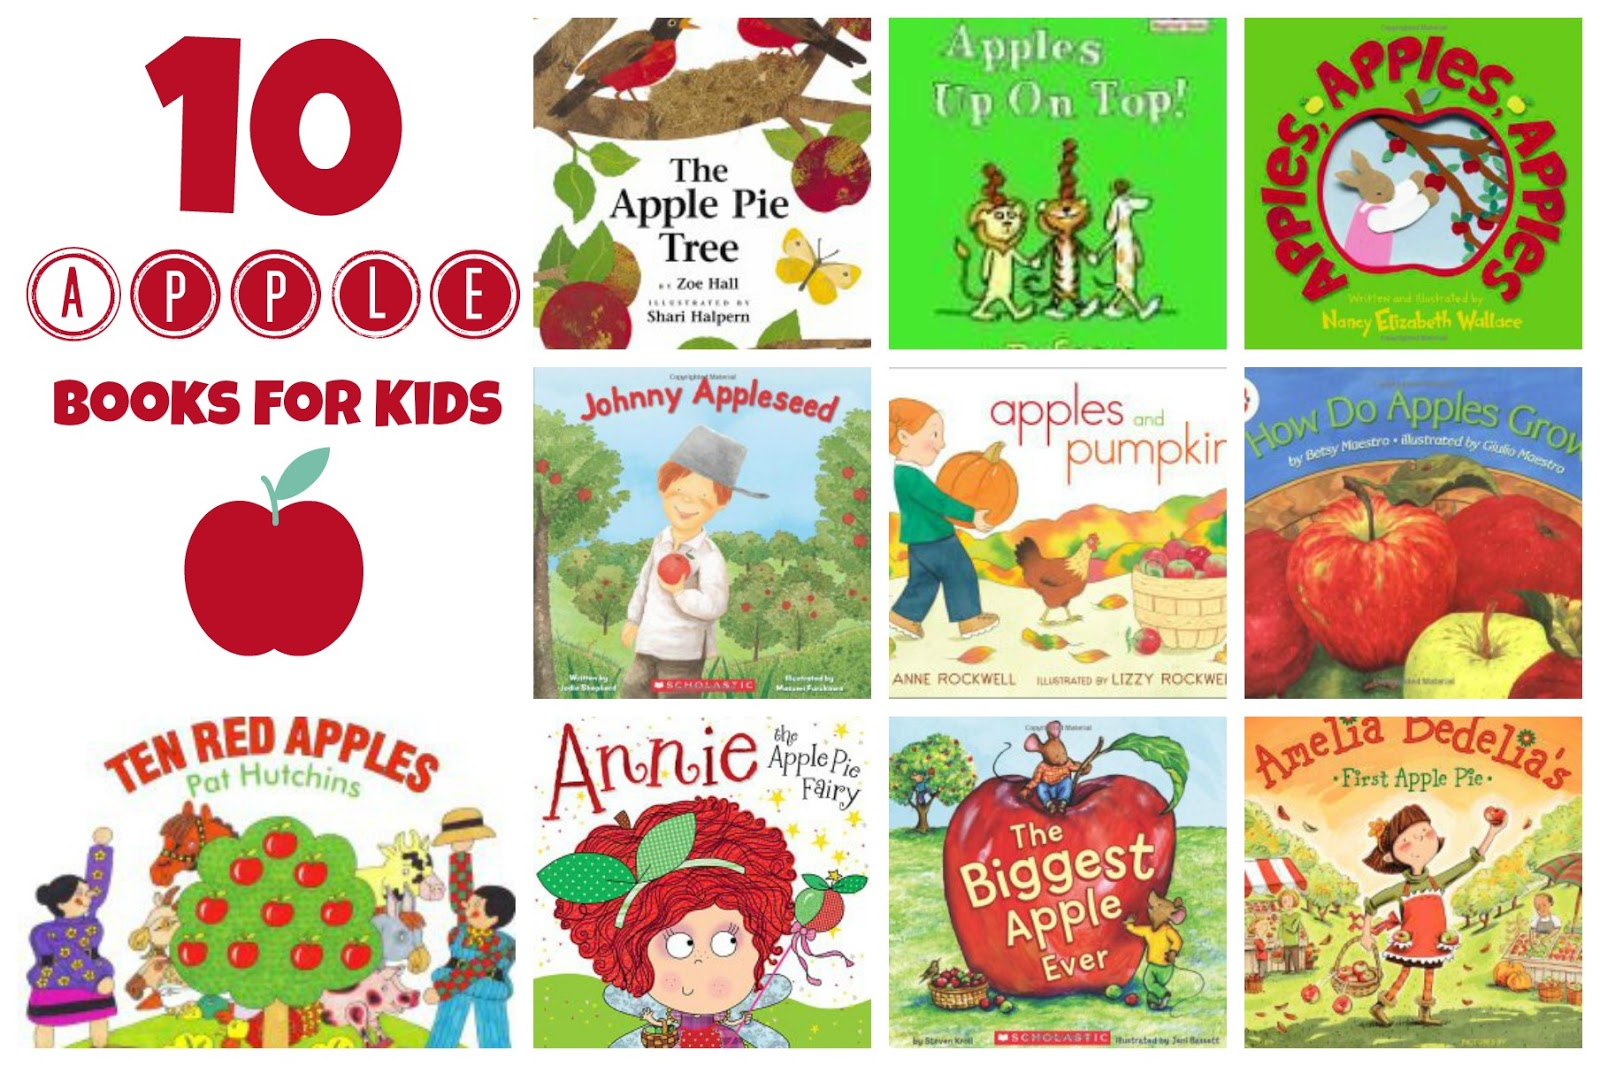 Preschool Apple Theme Activities and Books